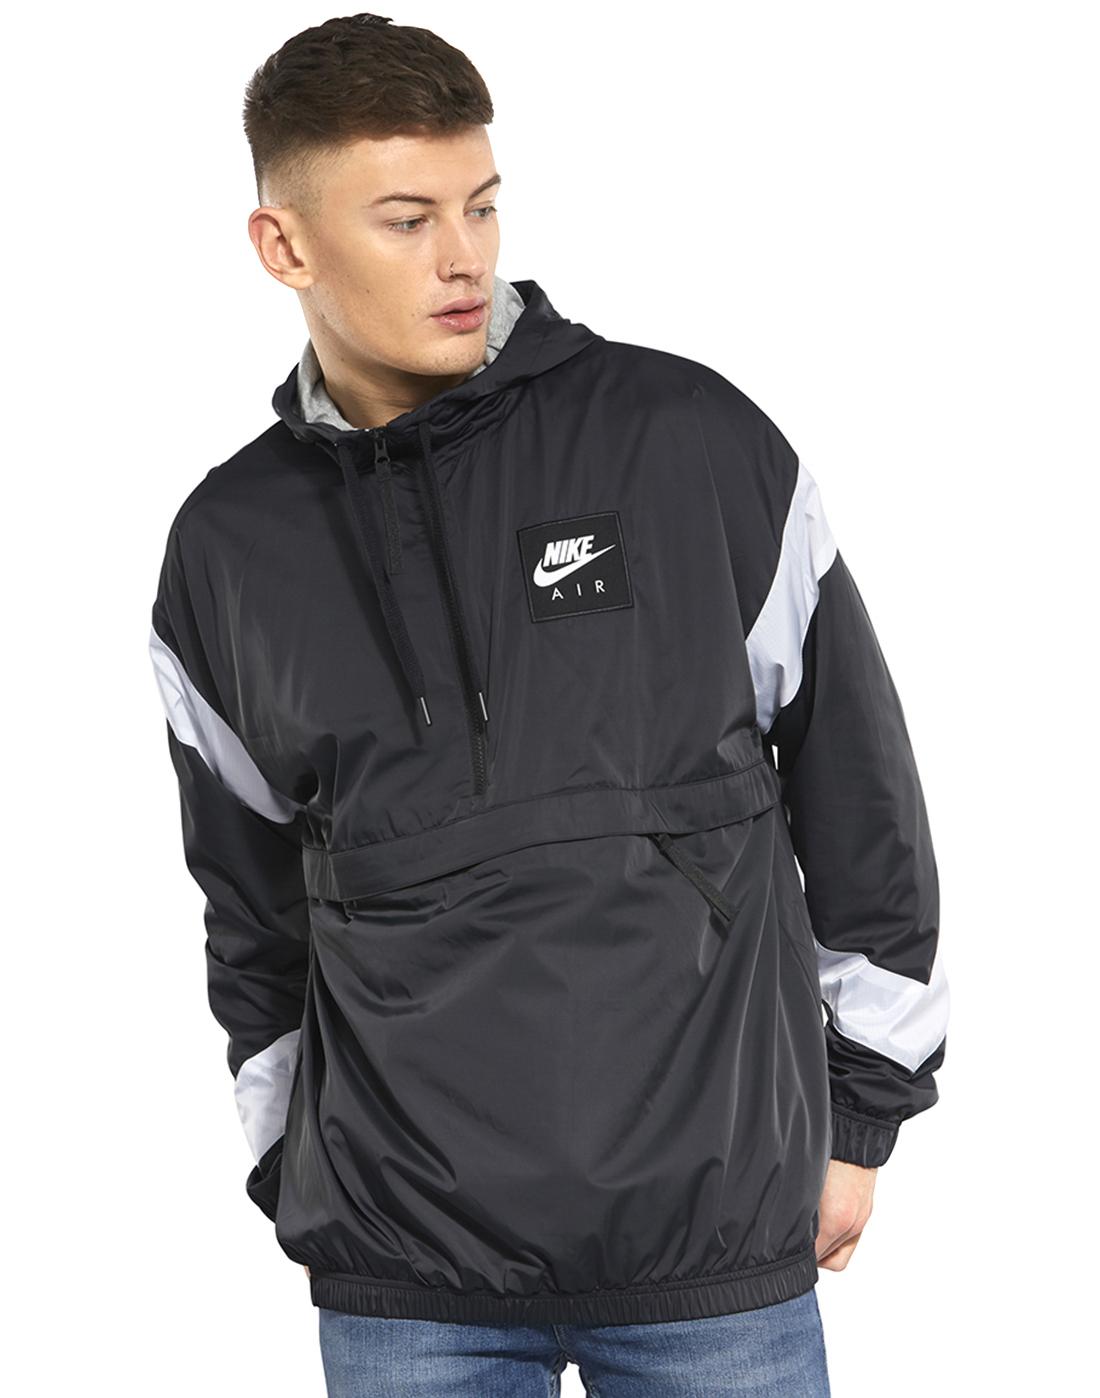 1ea7df7b5 Men's Nike Air Windrunner Jacket | Black | Life Style Sports